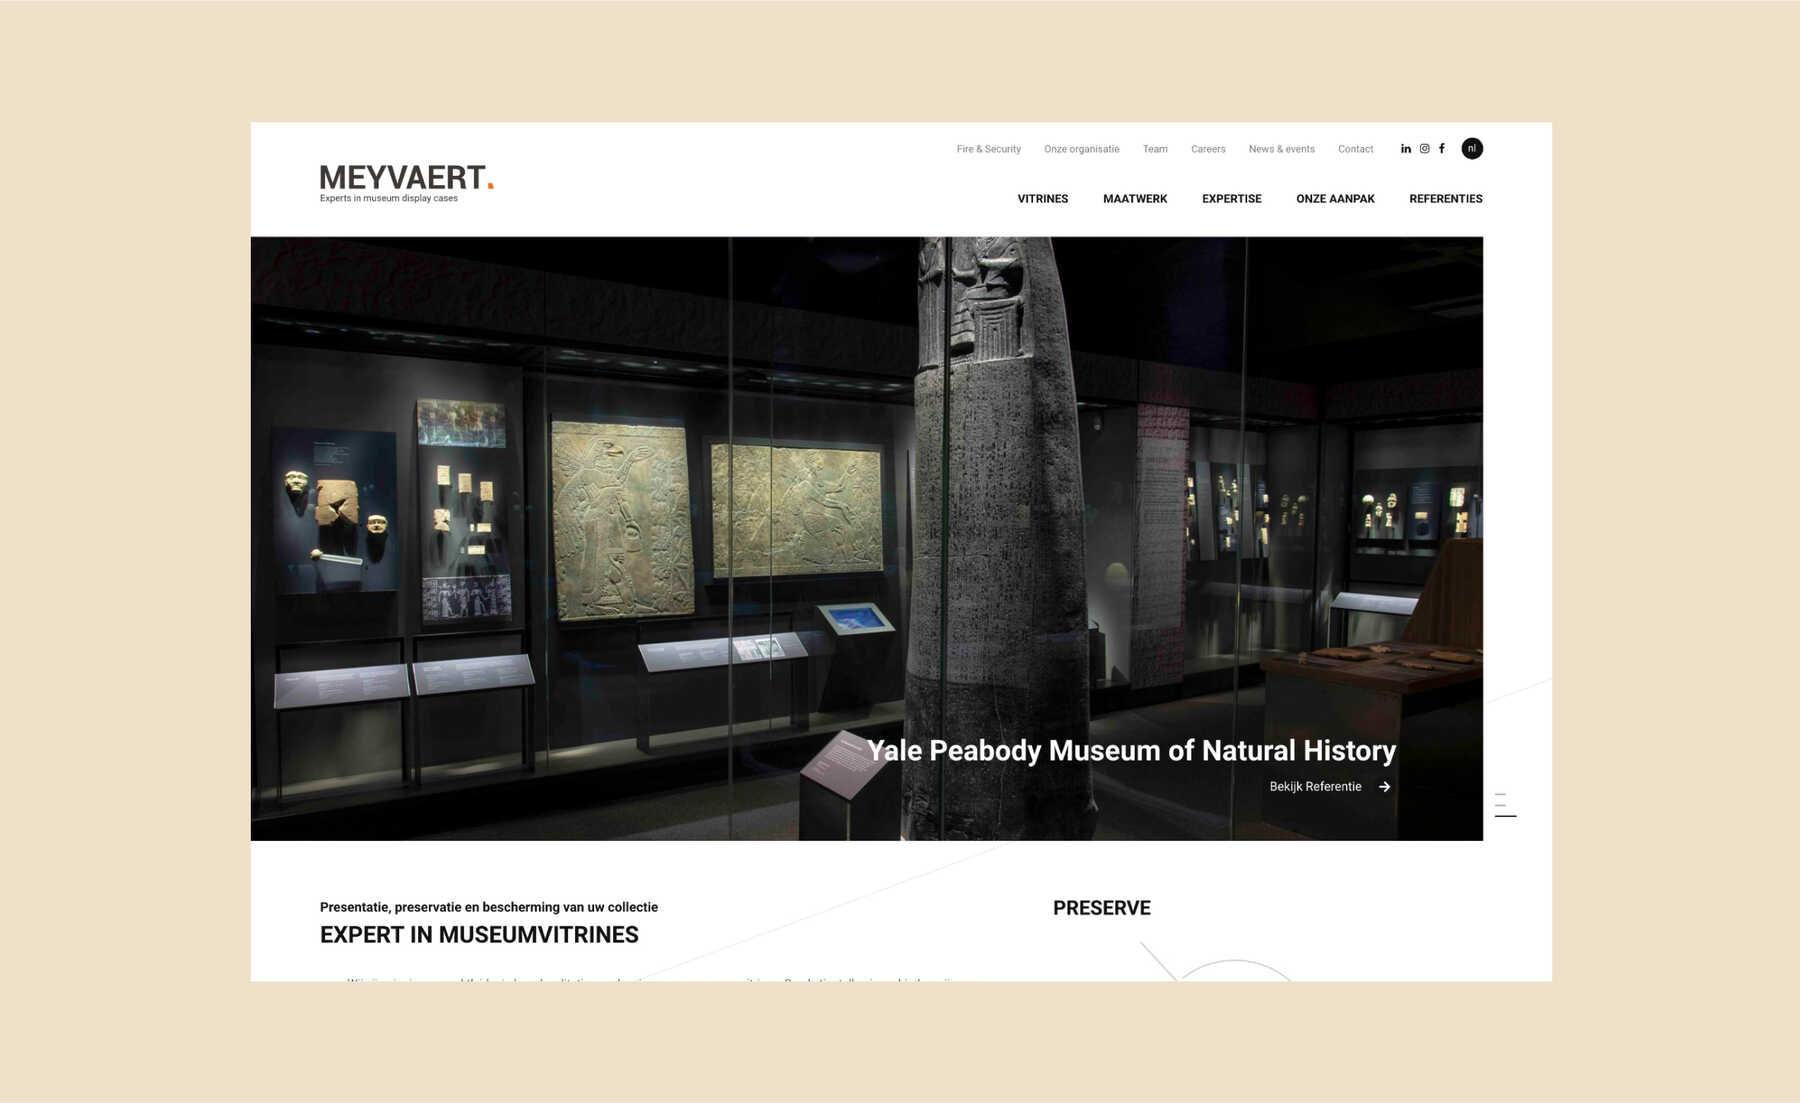 meyvaert yale peabody museum of natural history